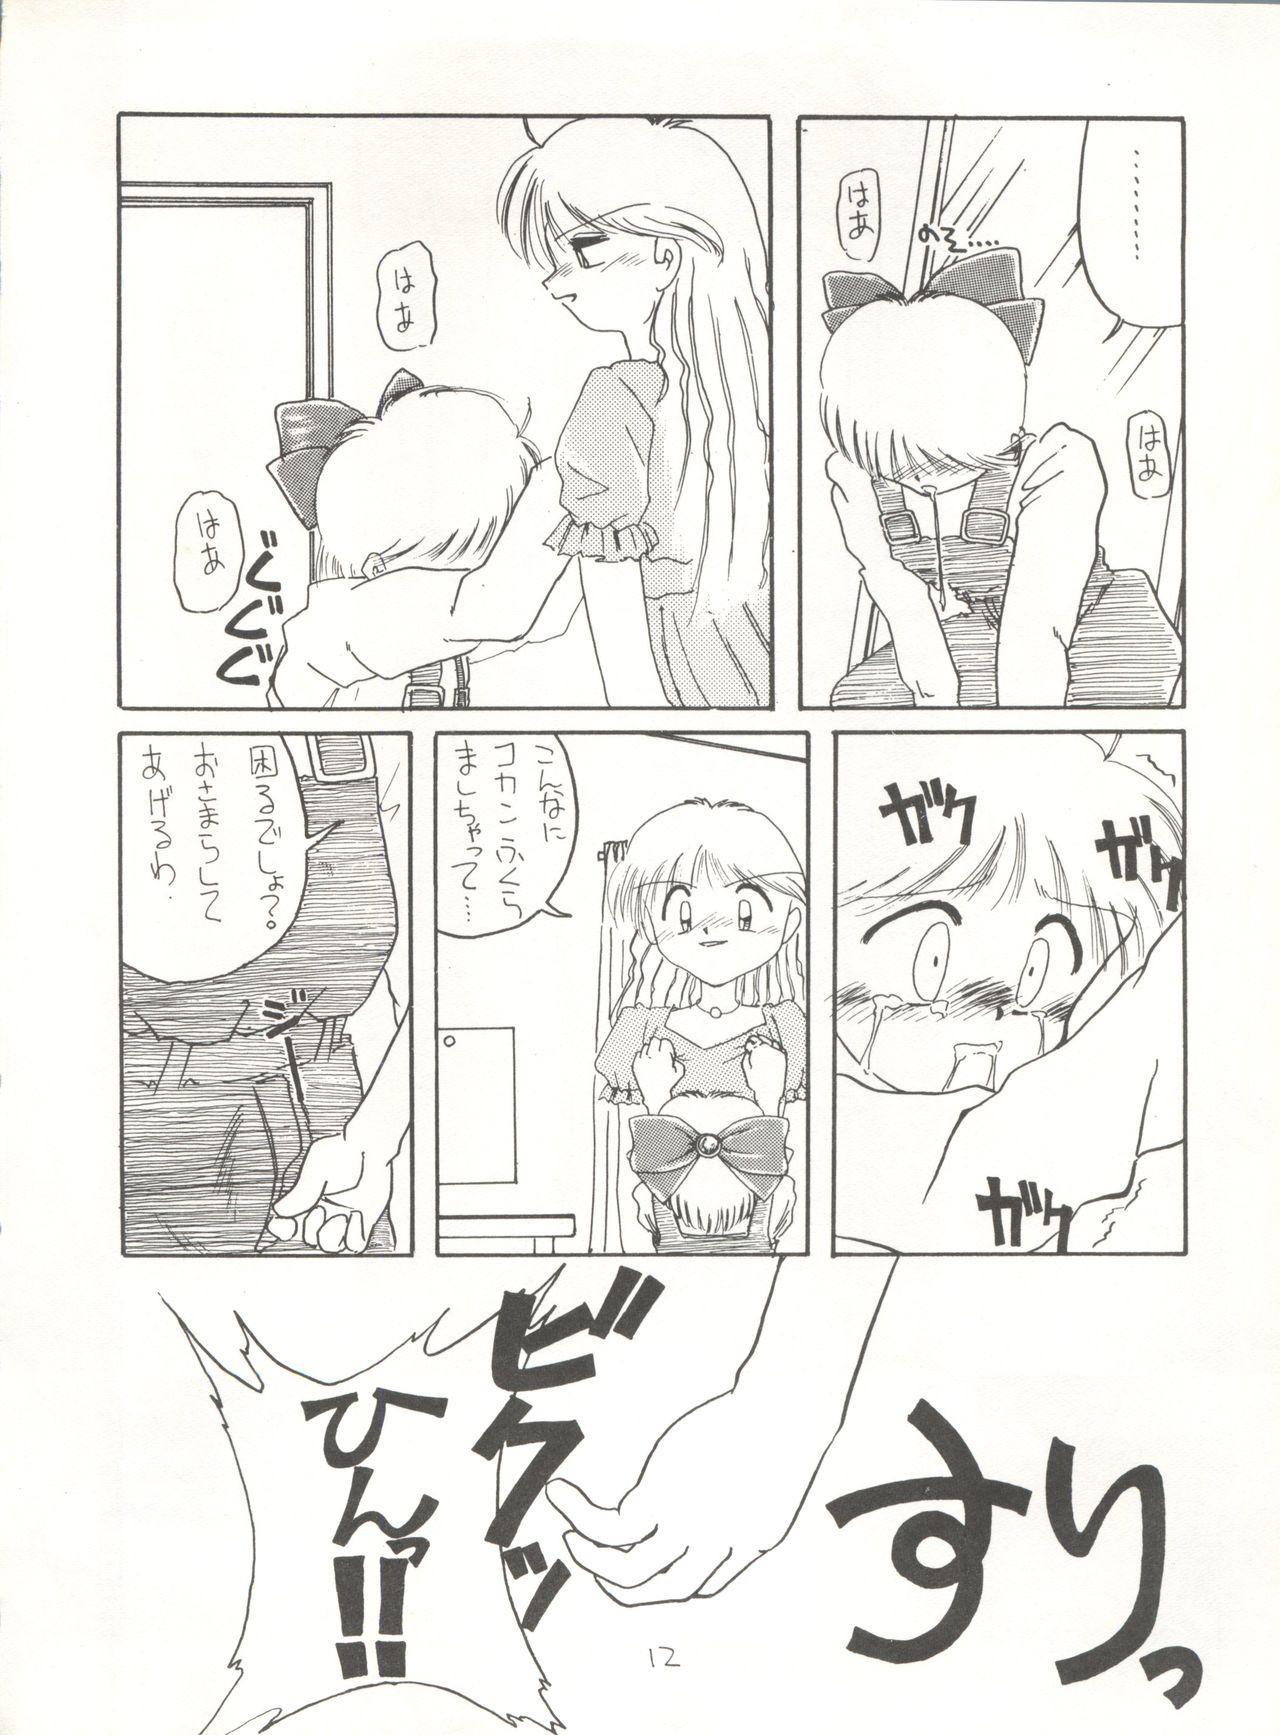 [Global One (MARO)] Sadistic 5 (Cutey Honey, Devilman, Sailor Moon), [Global One (MARO)] Sadistic (Dirty Pair, Fushigi no Umi no Nadia, Sailor Moon), [Studio Ikkatsumajin] .ribbon (Hime-chan's Ribbon) 135